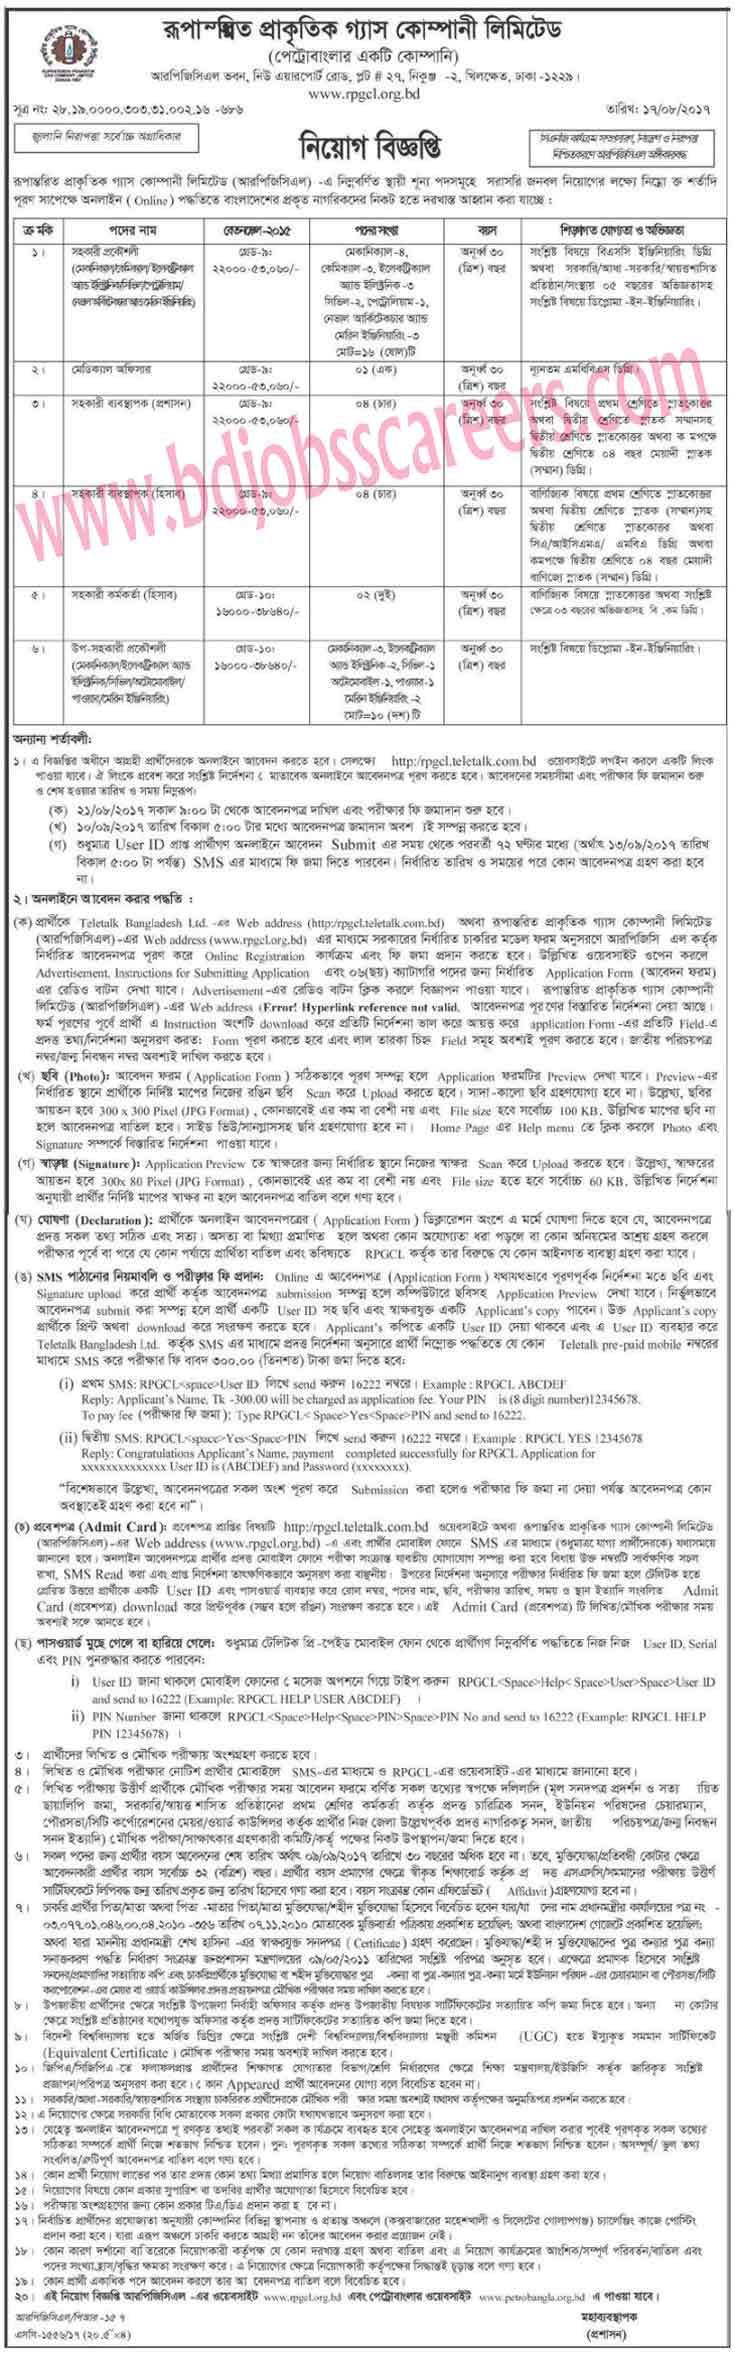 Rupantarita Prakritik Gas Company Limited Job Circular 2017